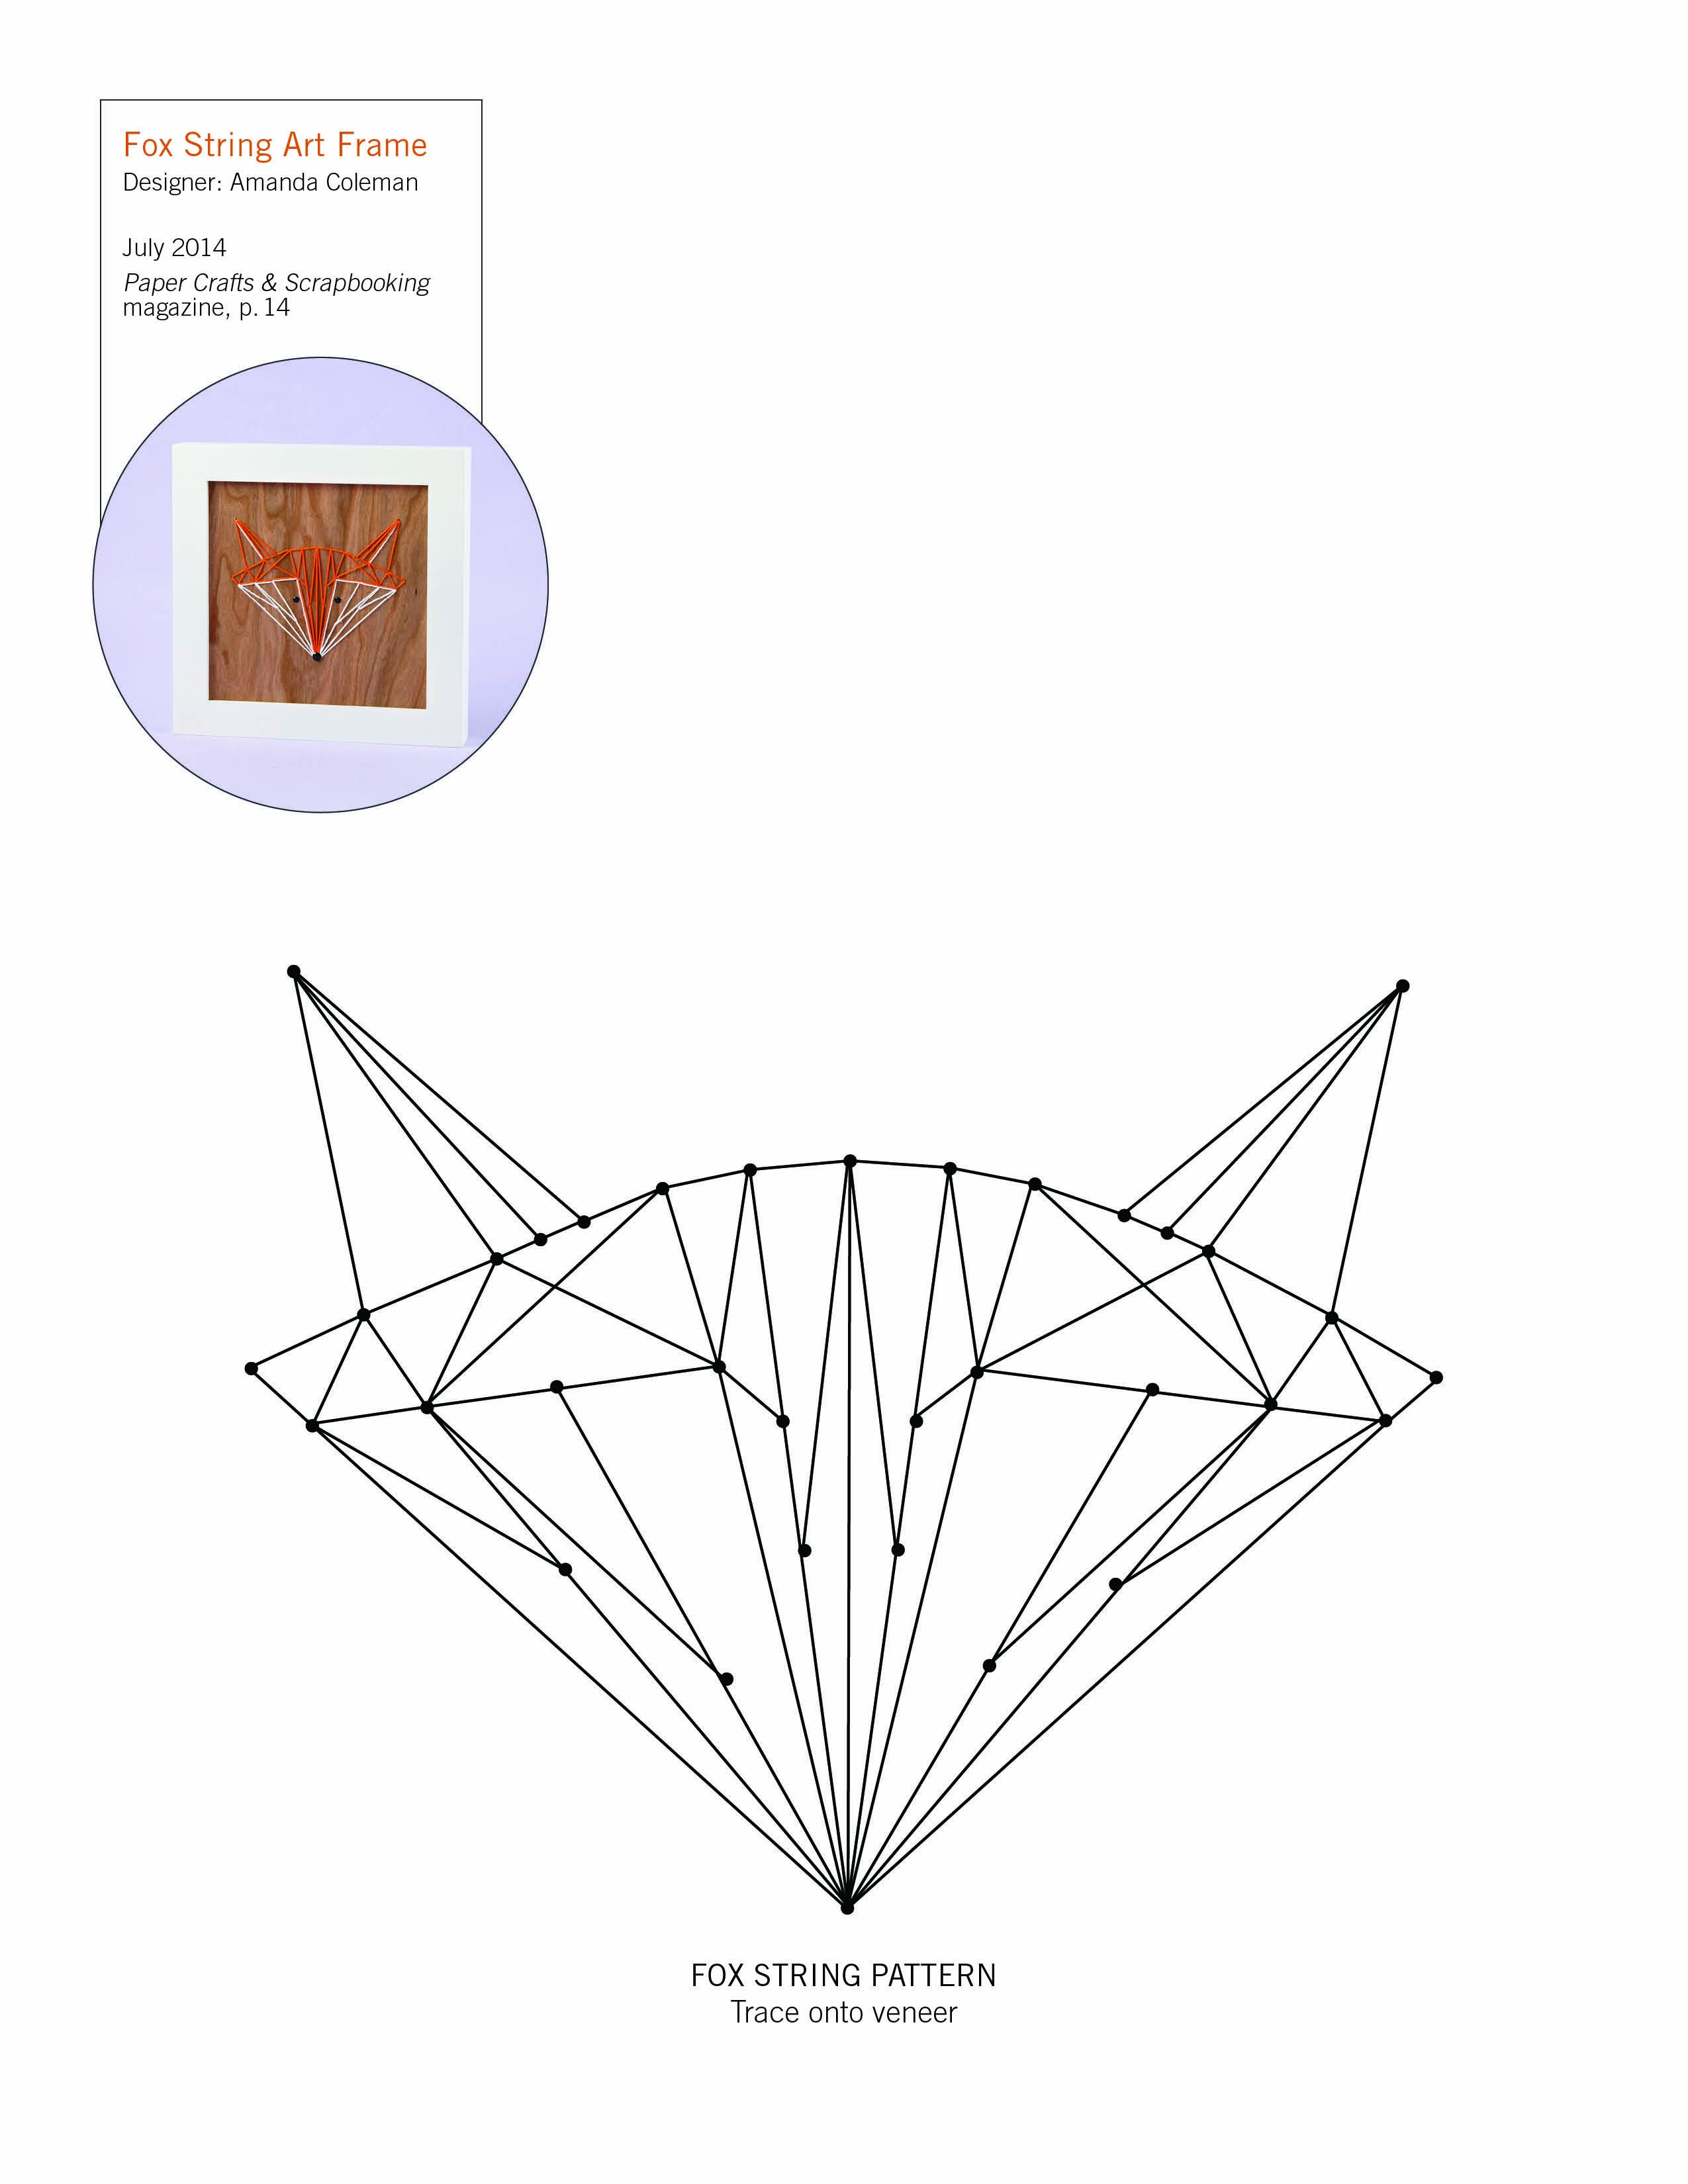 Image Result For Free Printable String Art Patterns | Diy | String - Free Printable String Art Patterns